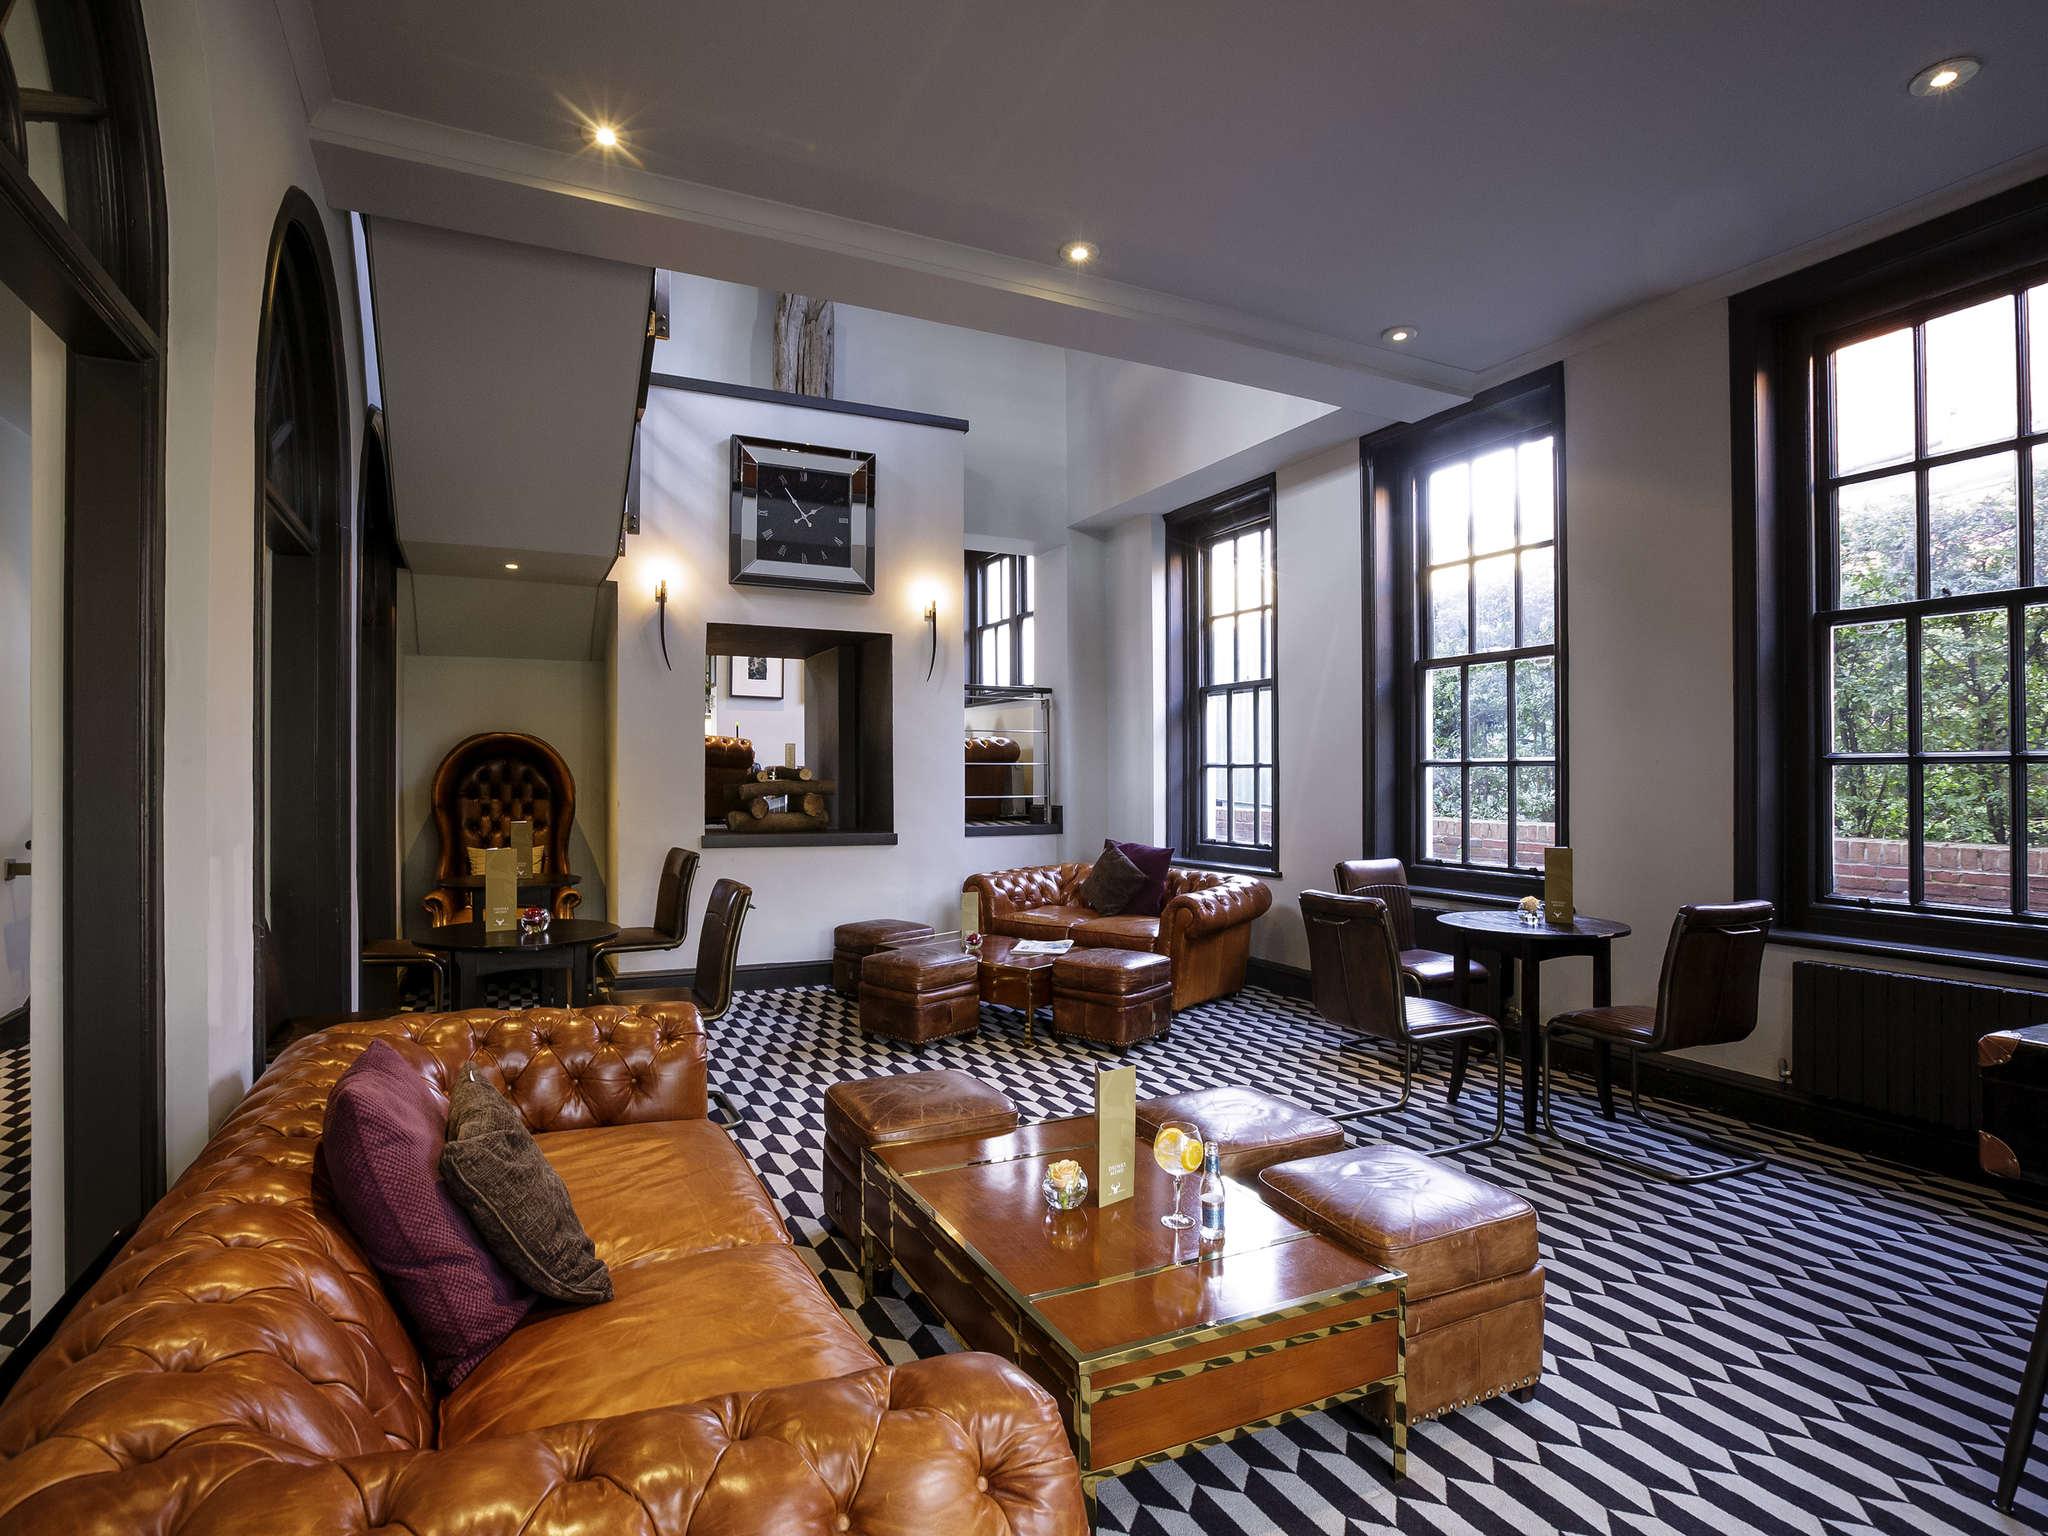 Hunton Park Hotel Watford